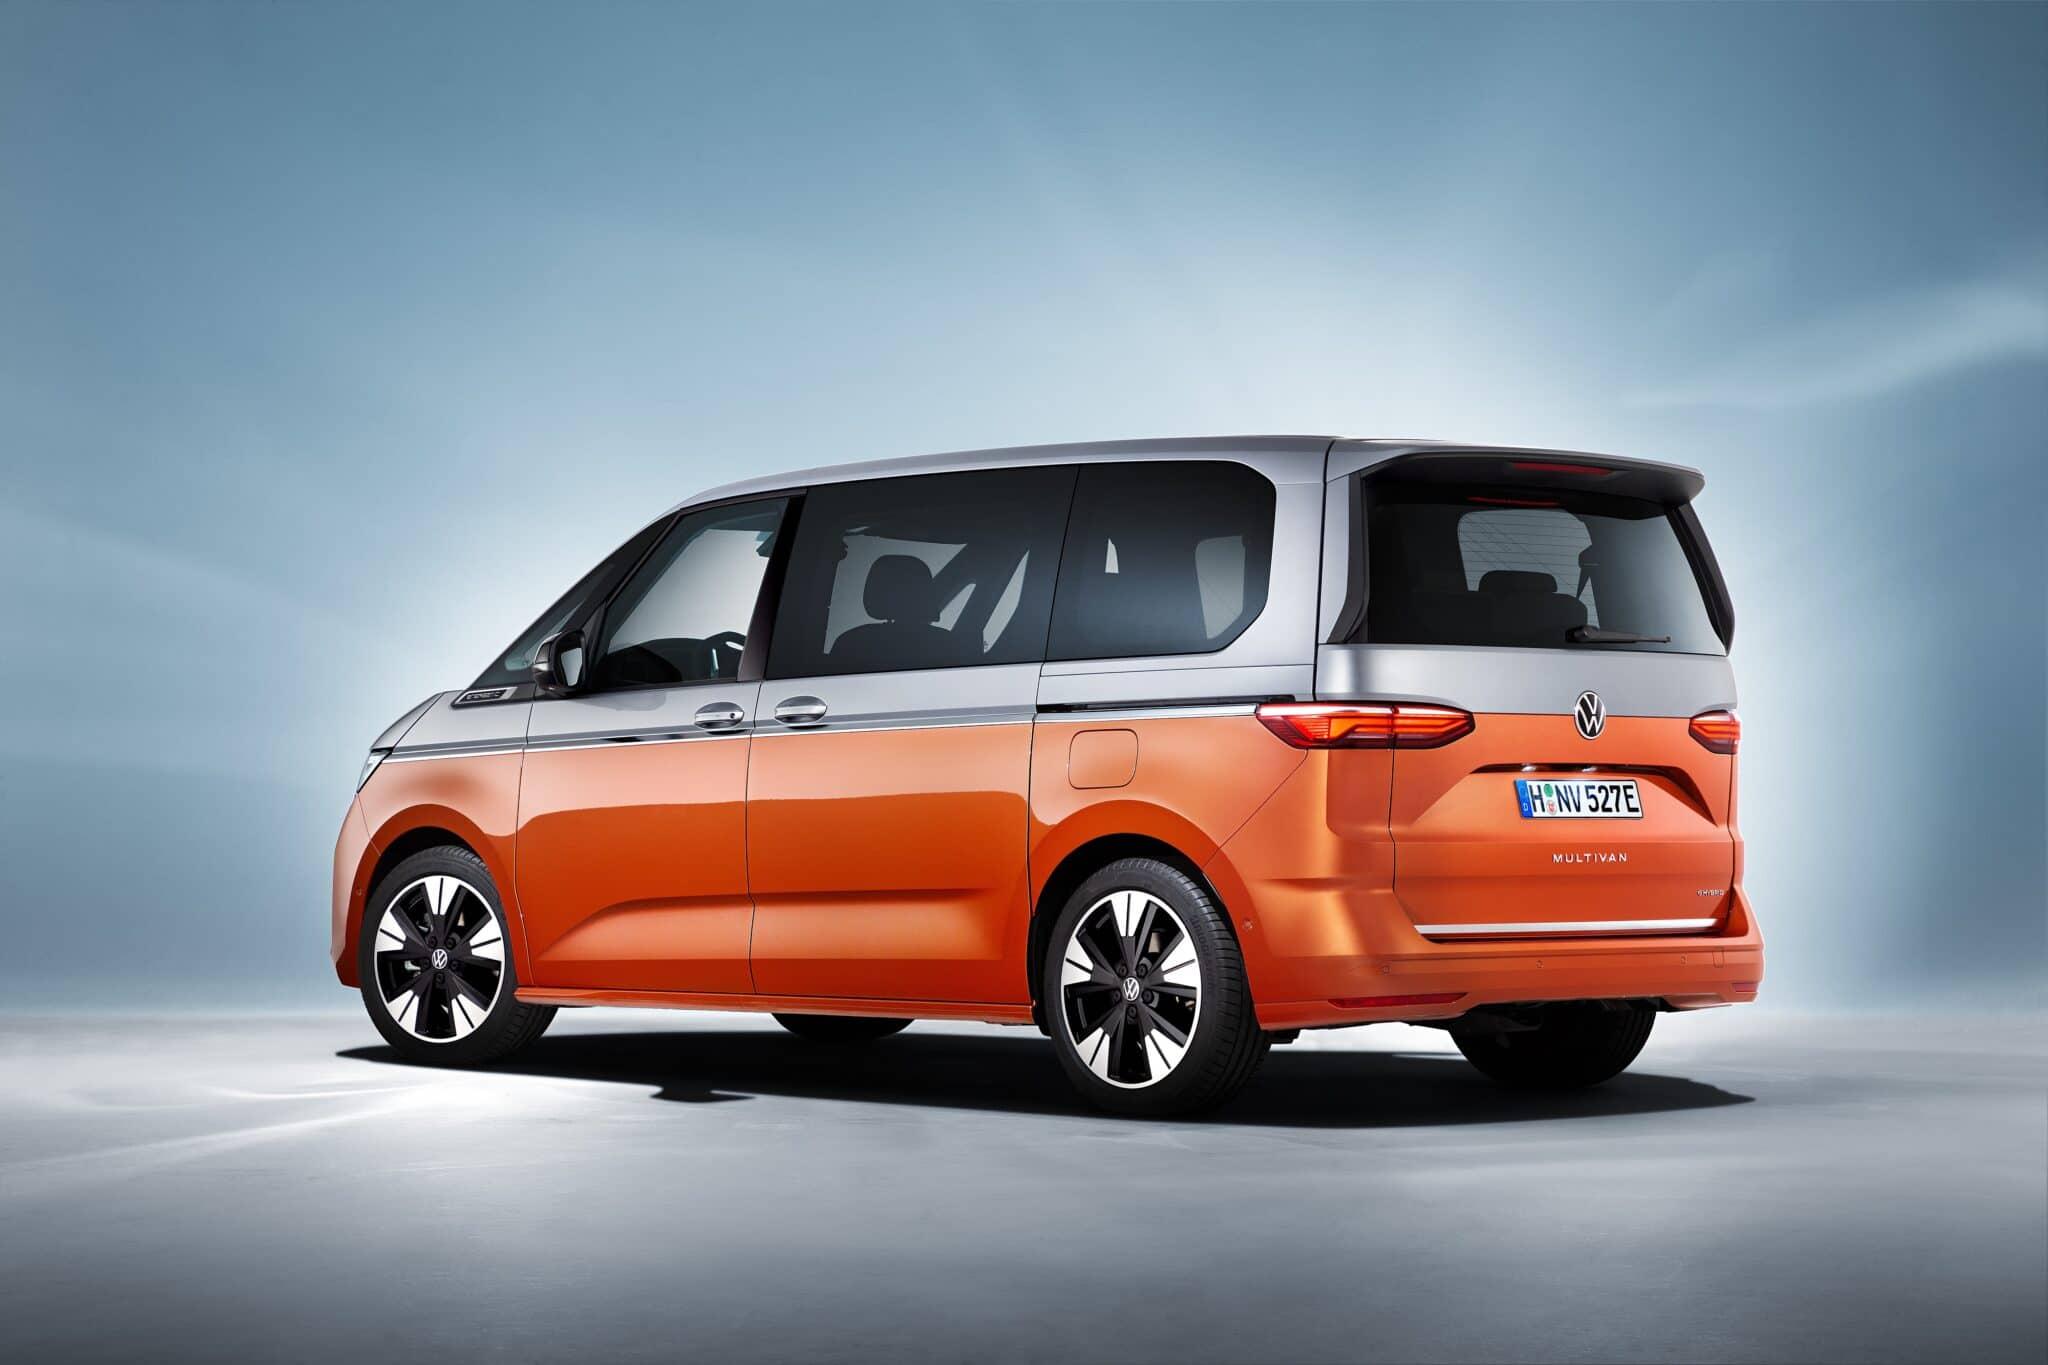 Volkswagen Multivan - Copyright: Ufficio stampa Volkswagen Italia